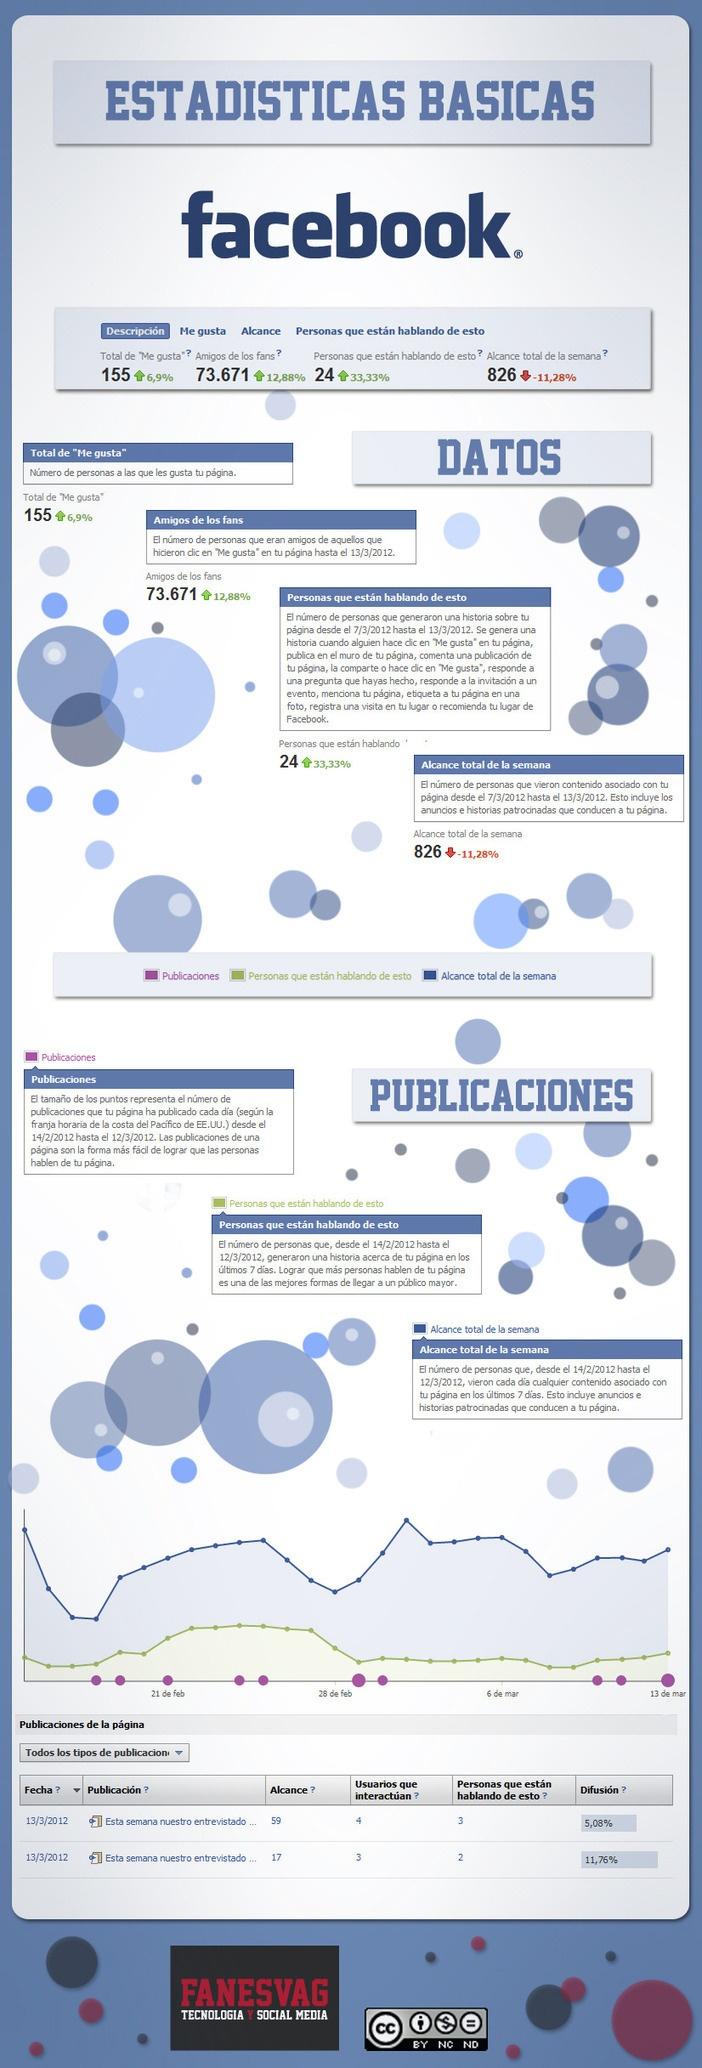 #Infografia : Estadisticas de #Facebook